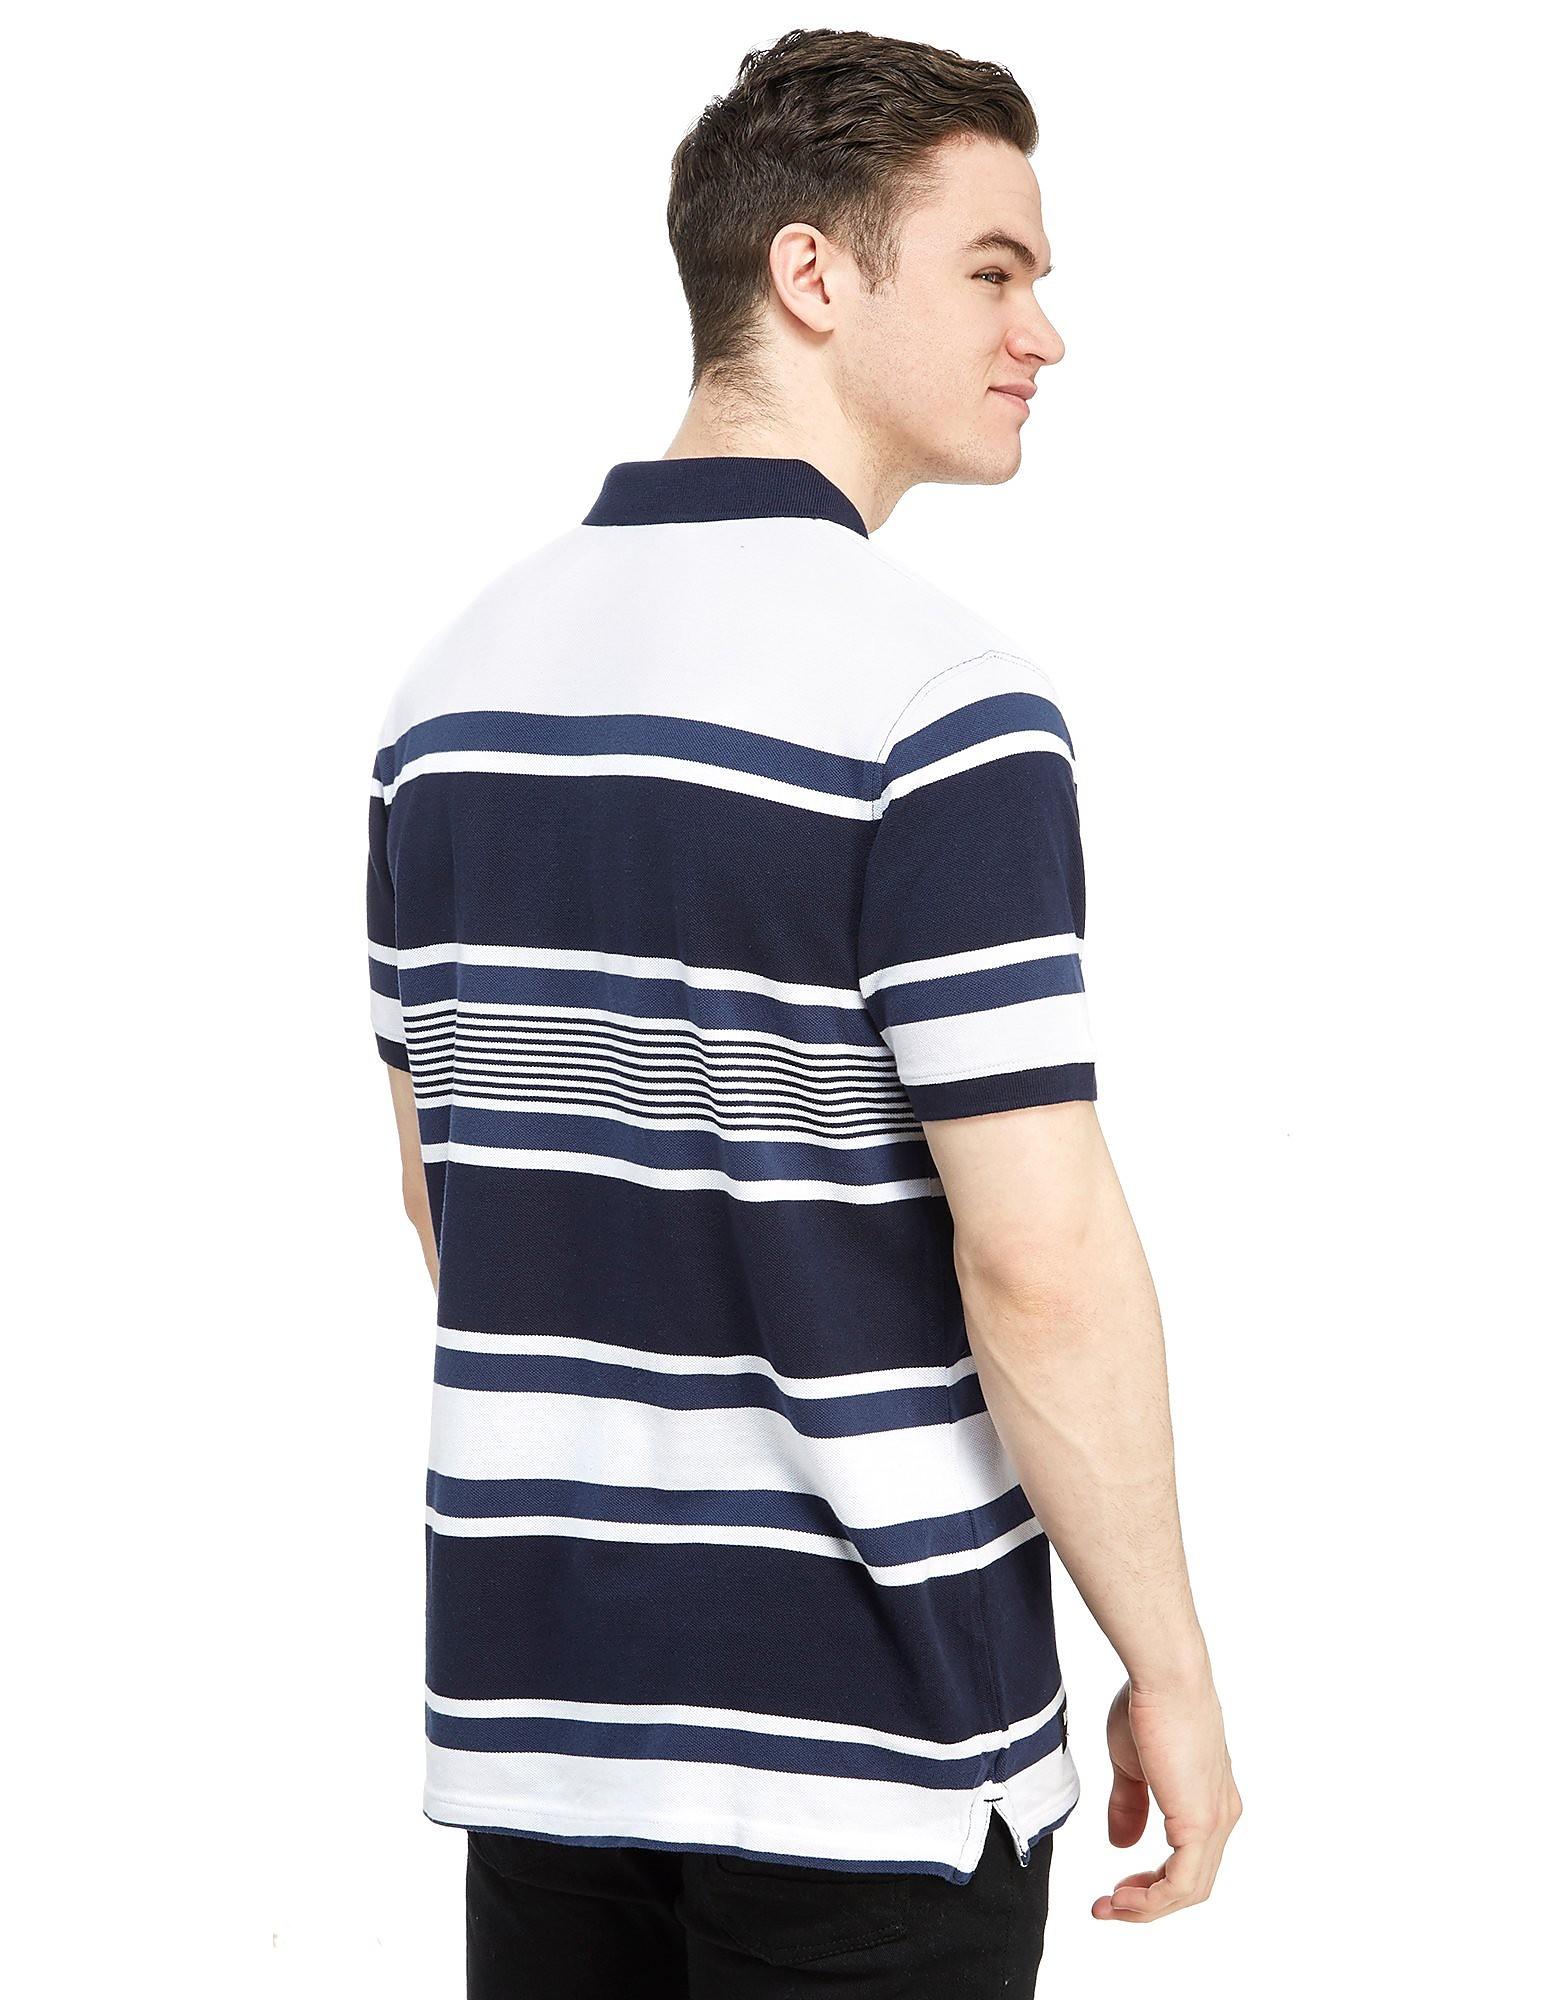 McKenzie Causeway Polo Shirt